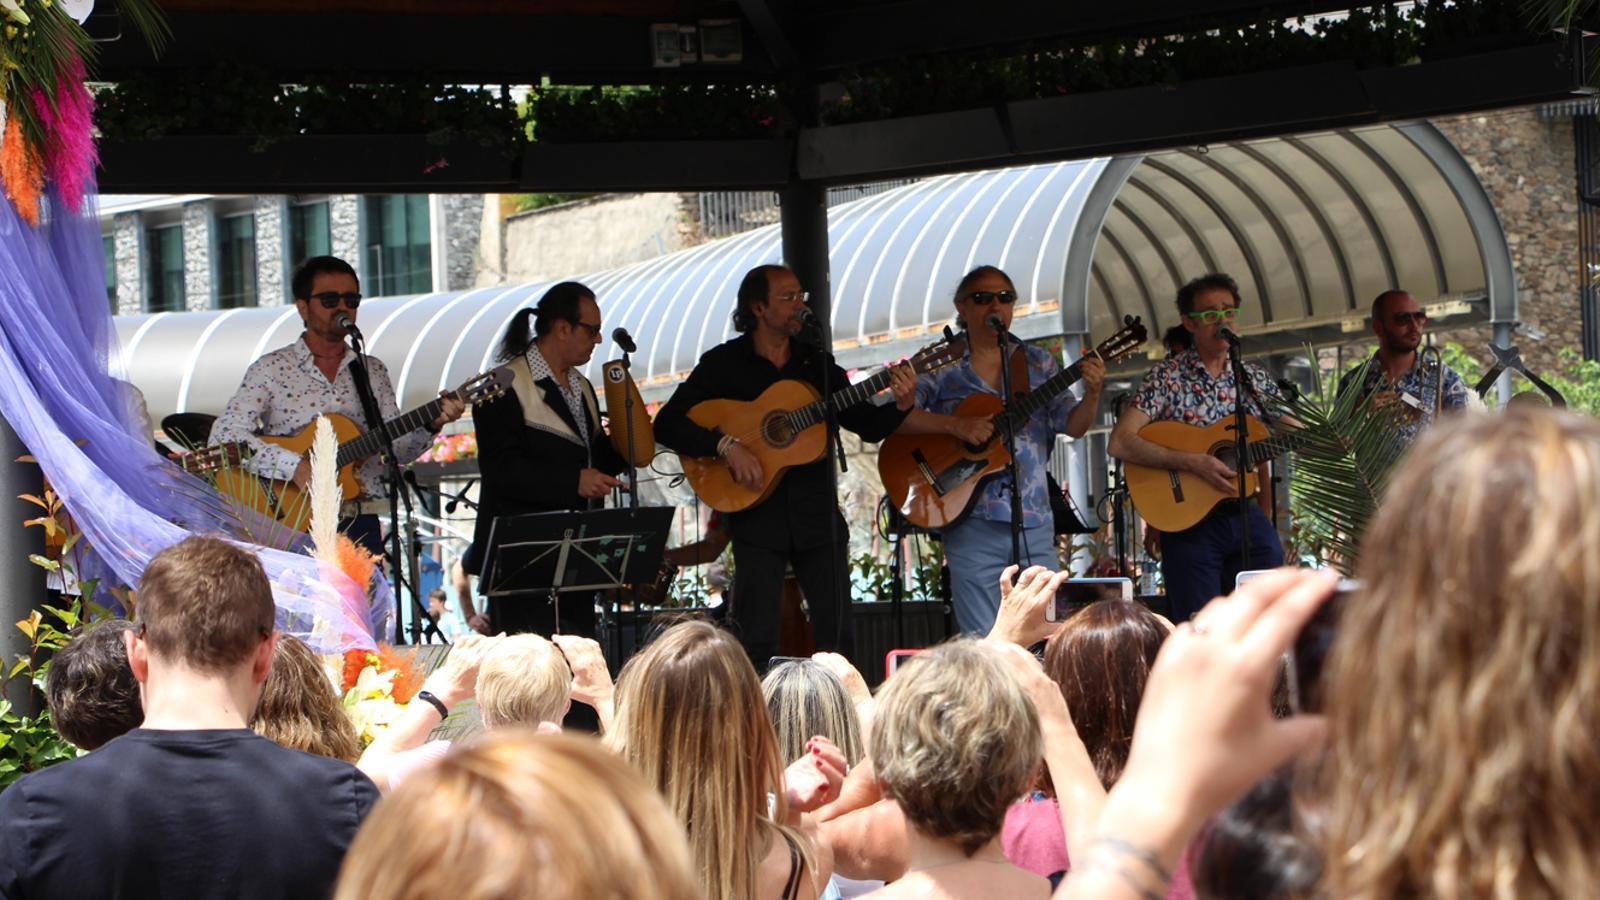 El concert de Los Manolos aplega centenars de persones a la plaça del Poble d'Andorra la Vella. / M. P. (ANA)